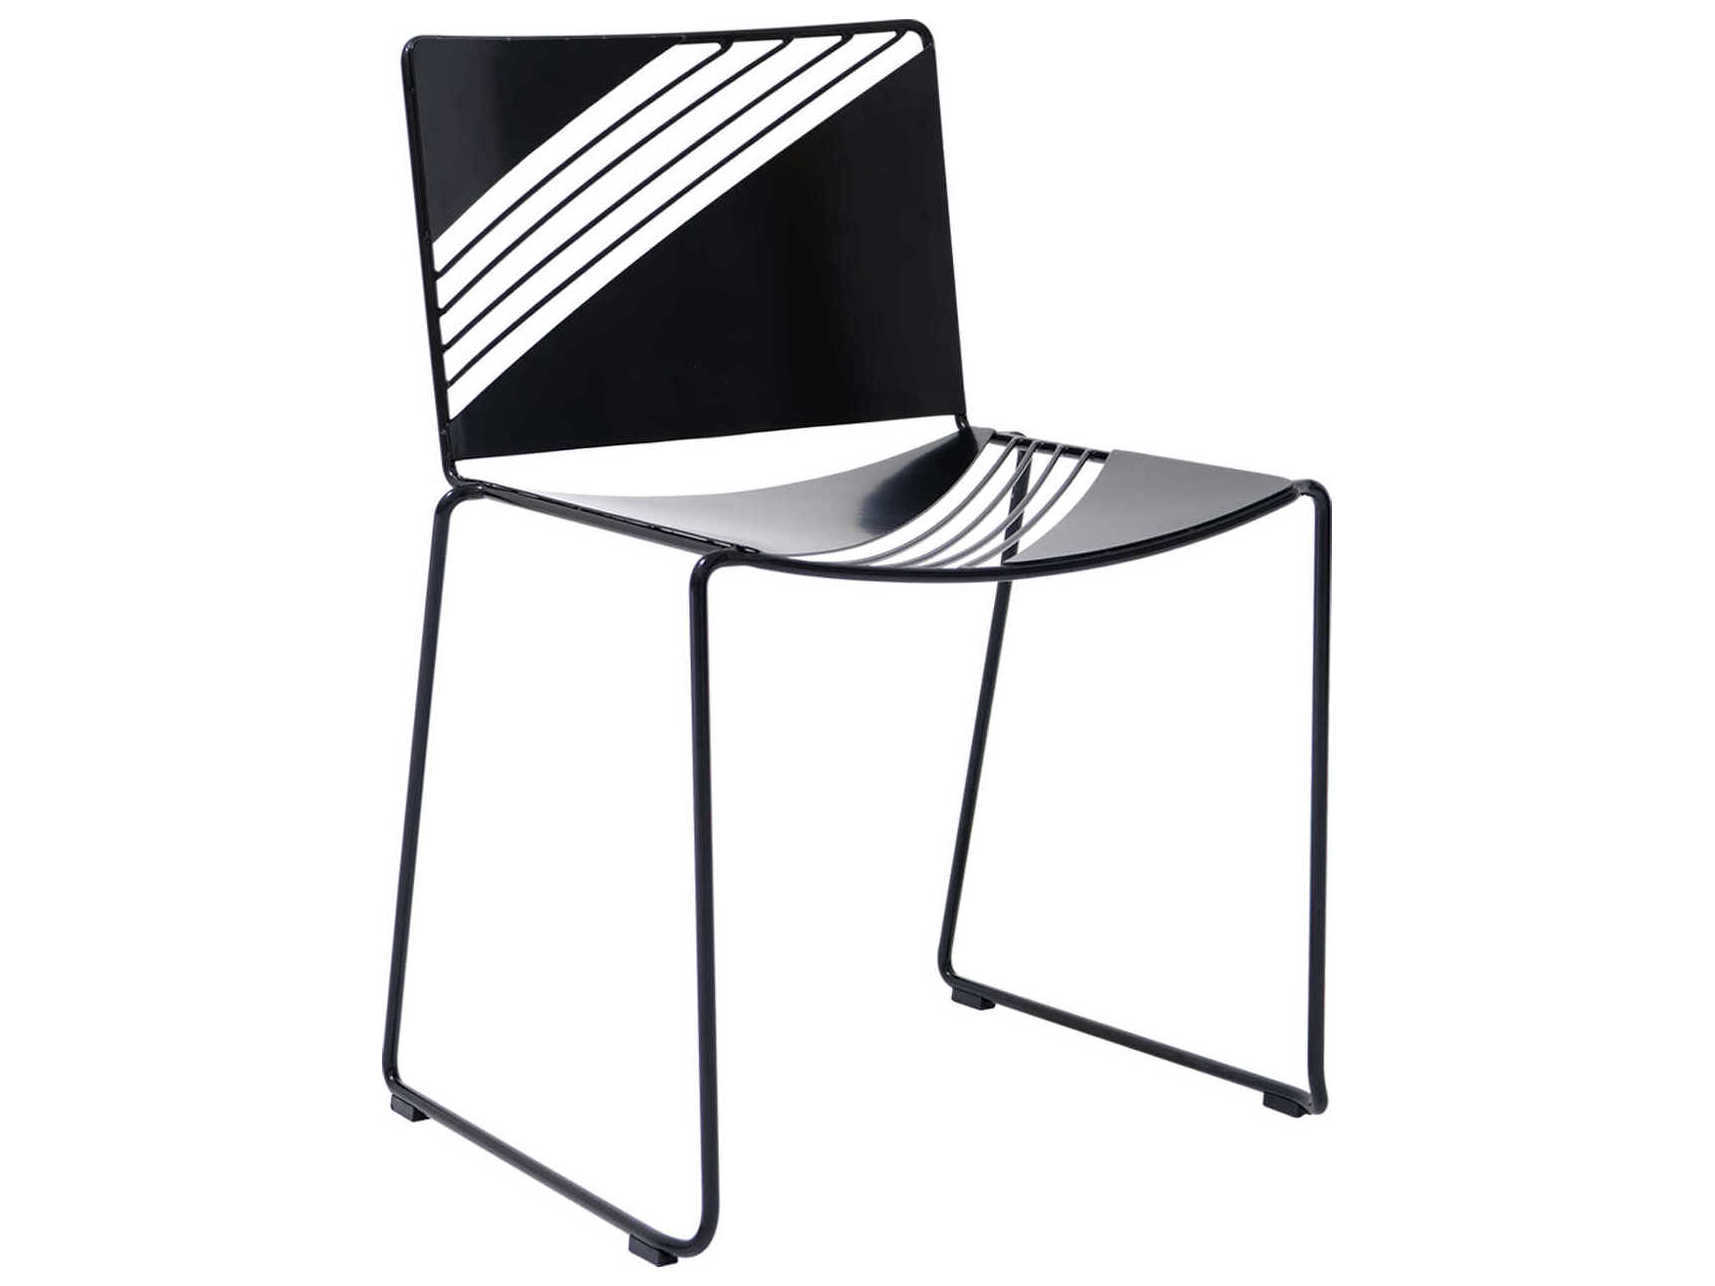 Astounding Bend Goods Outdoor Cafe Black Metal Dining Chair Forskolin Free Trial Chair Design Images Forskolin Free Trialorg